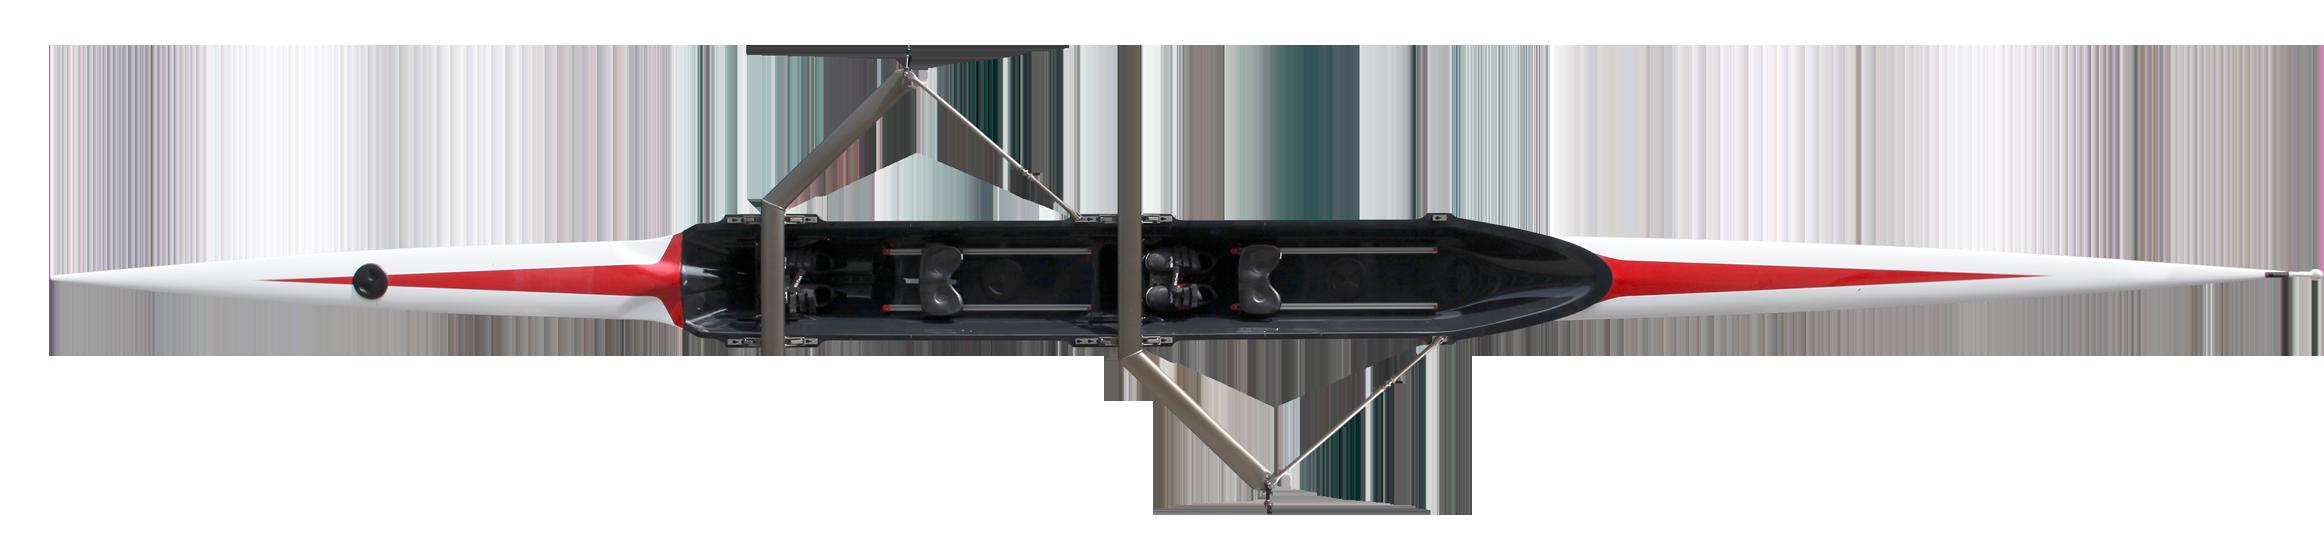 Rowing HD PNG - 119499